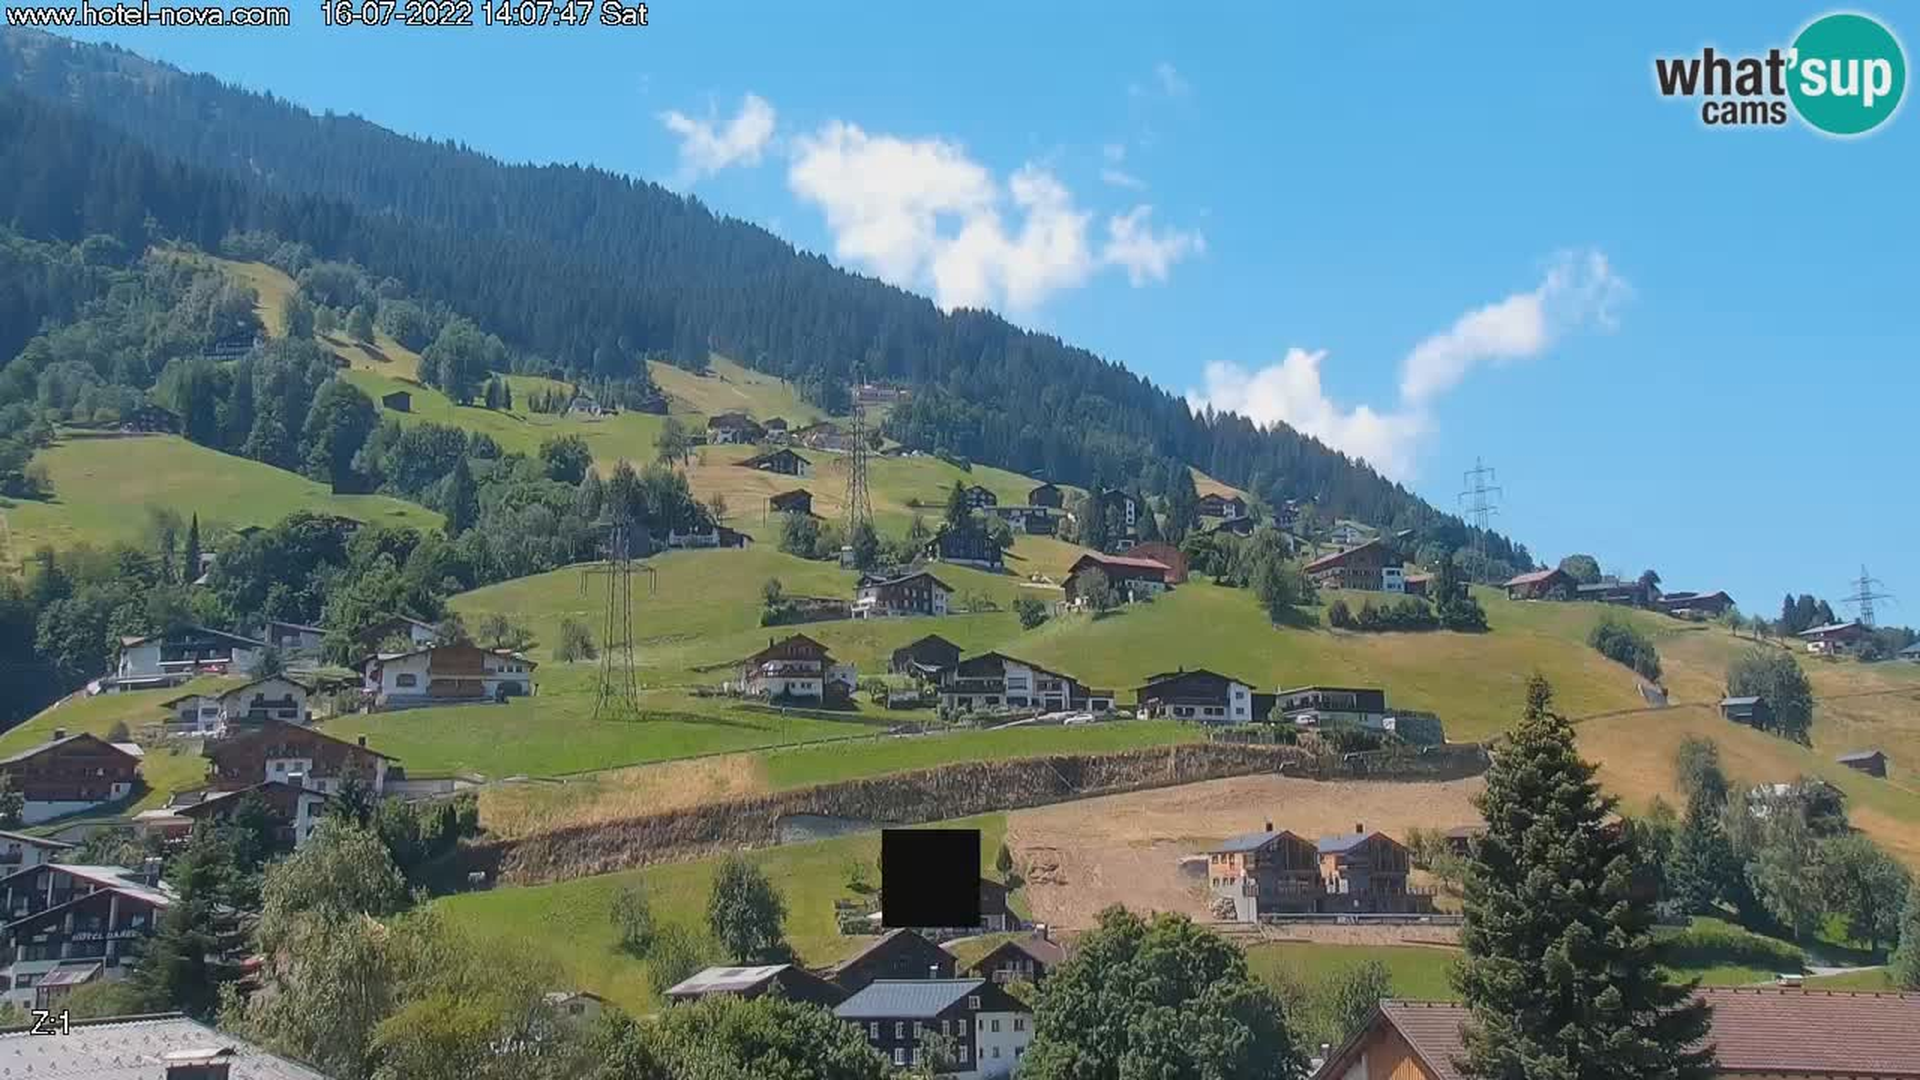 Gaschurn live webcam Hotel Nova – Montafon